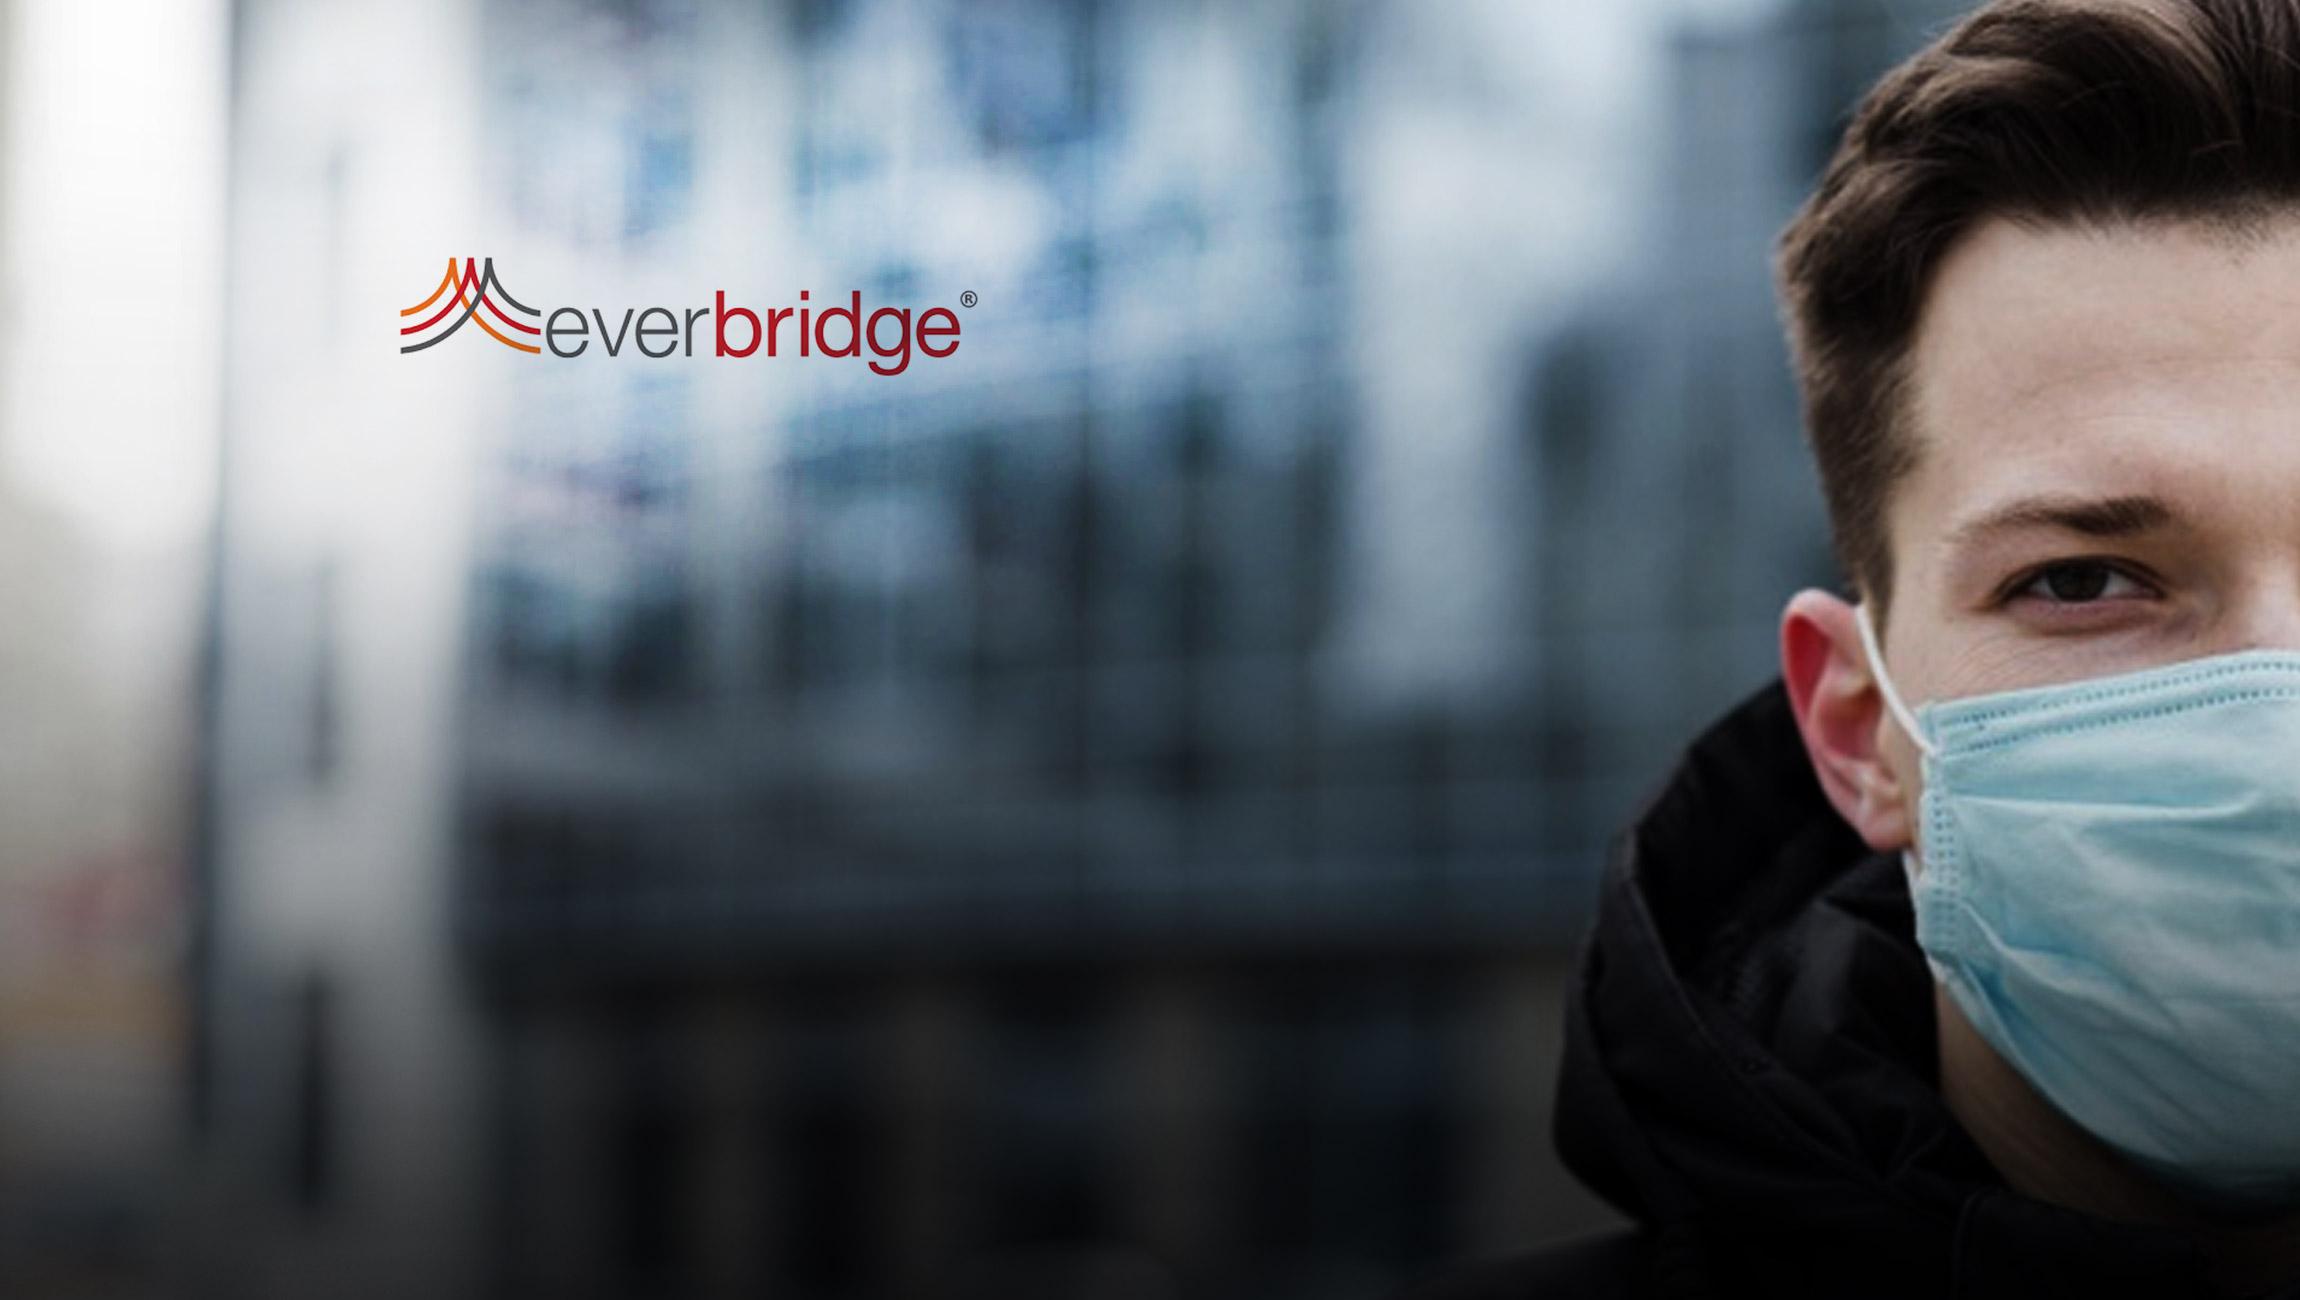 Everbridge Recognized in the 2020 Gartner Report: Market Guide for Social Distancing Technology